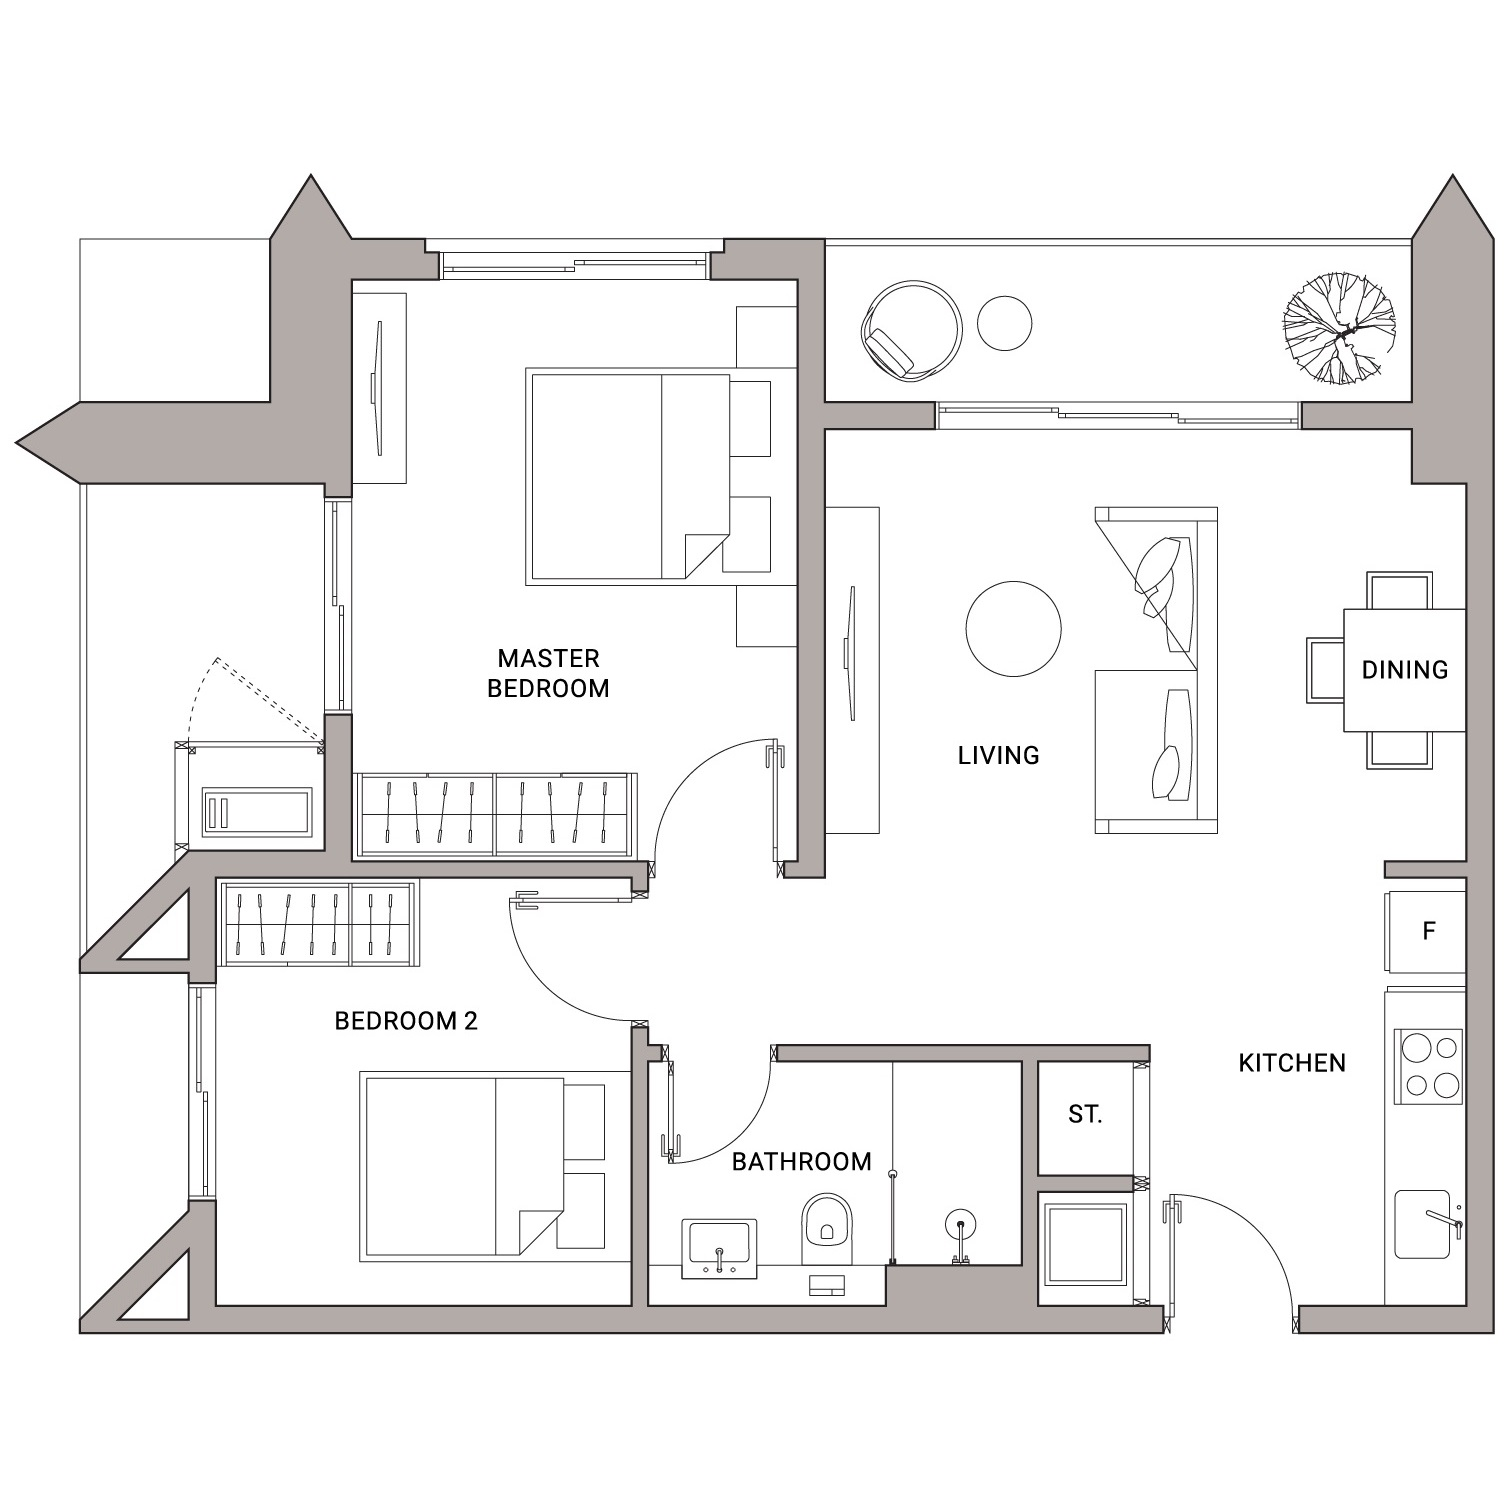 Urbanland - Embassy Central - Phnom Penh Luxury Condominium - B2 Unit floor plan